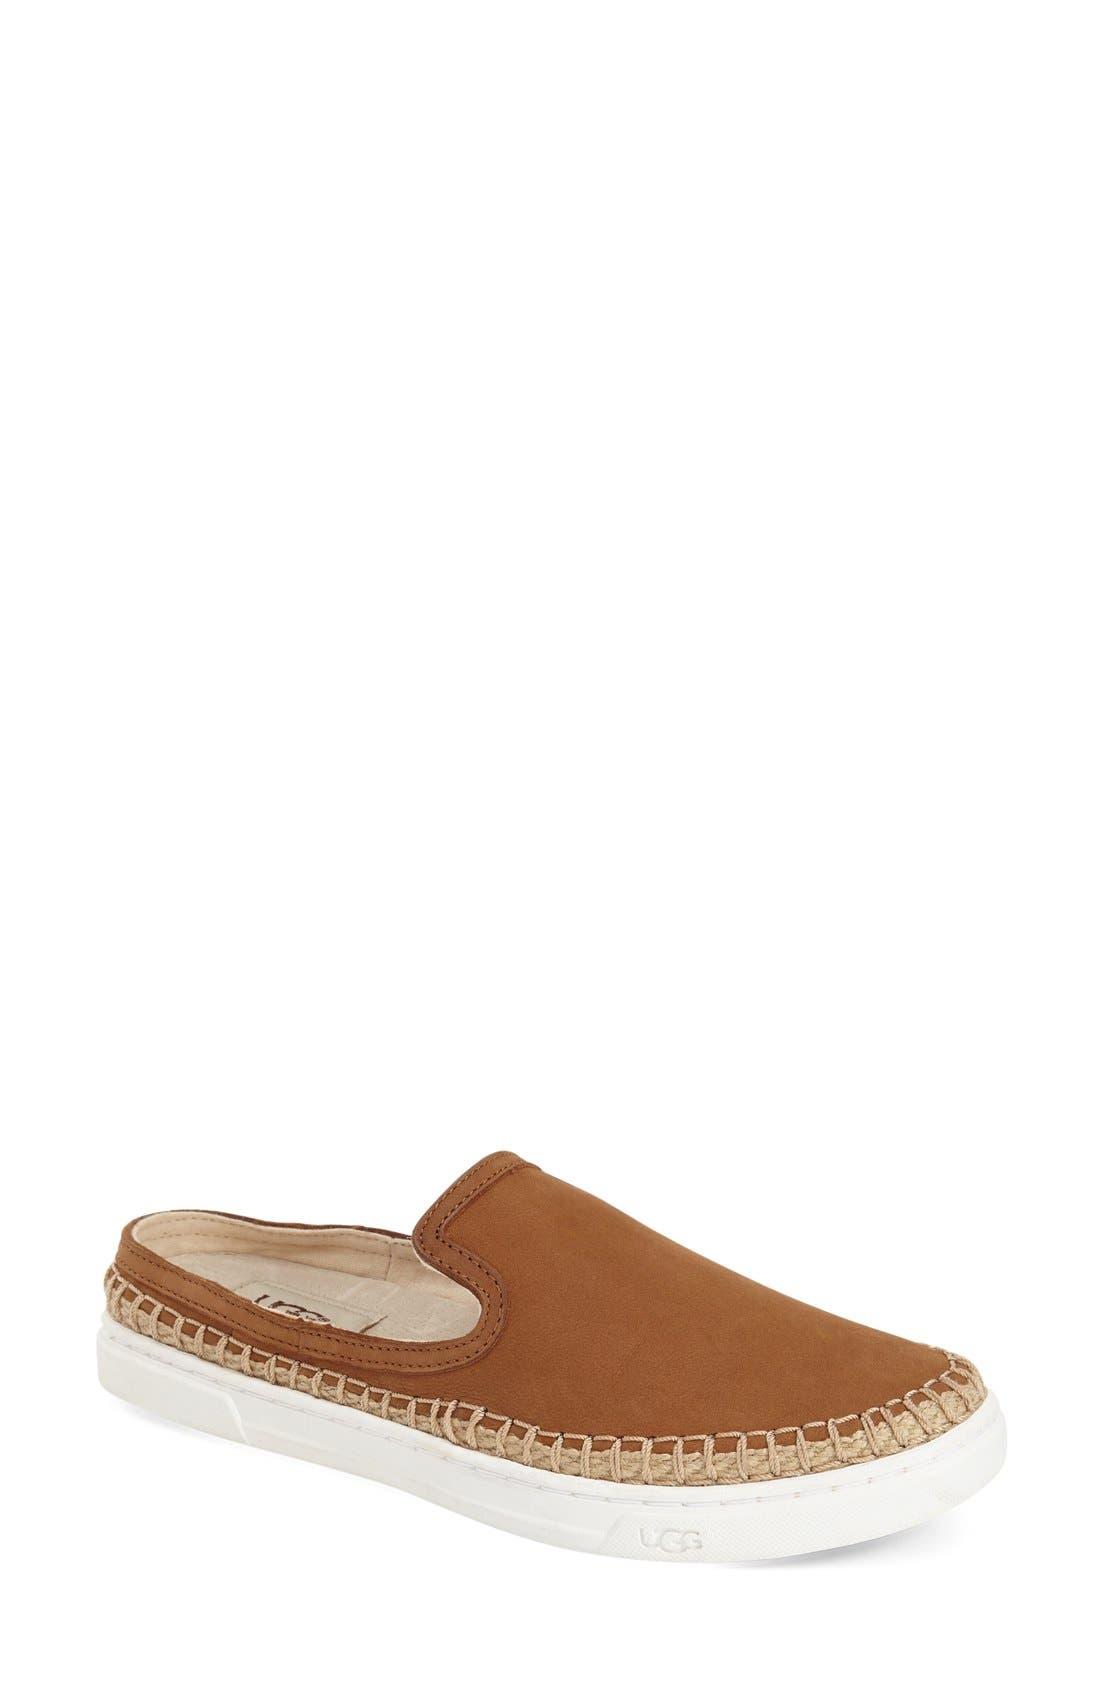 'Caleel' Slip-On Sneaker,                         Main,                         color, 219